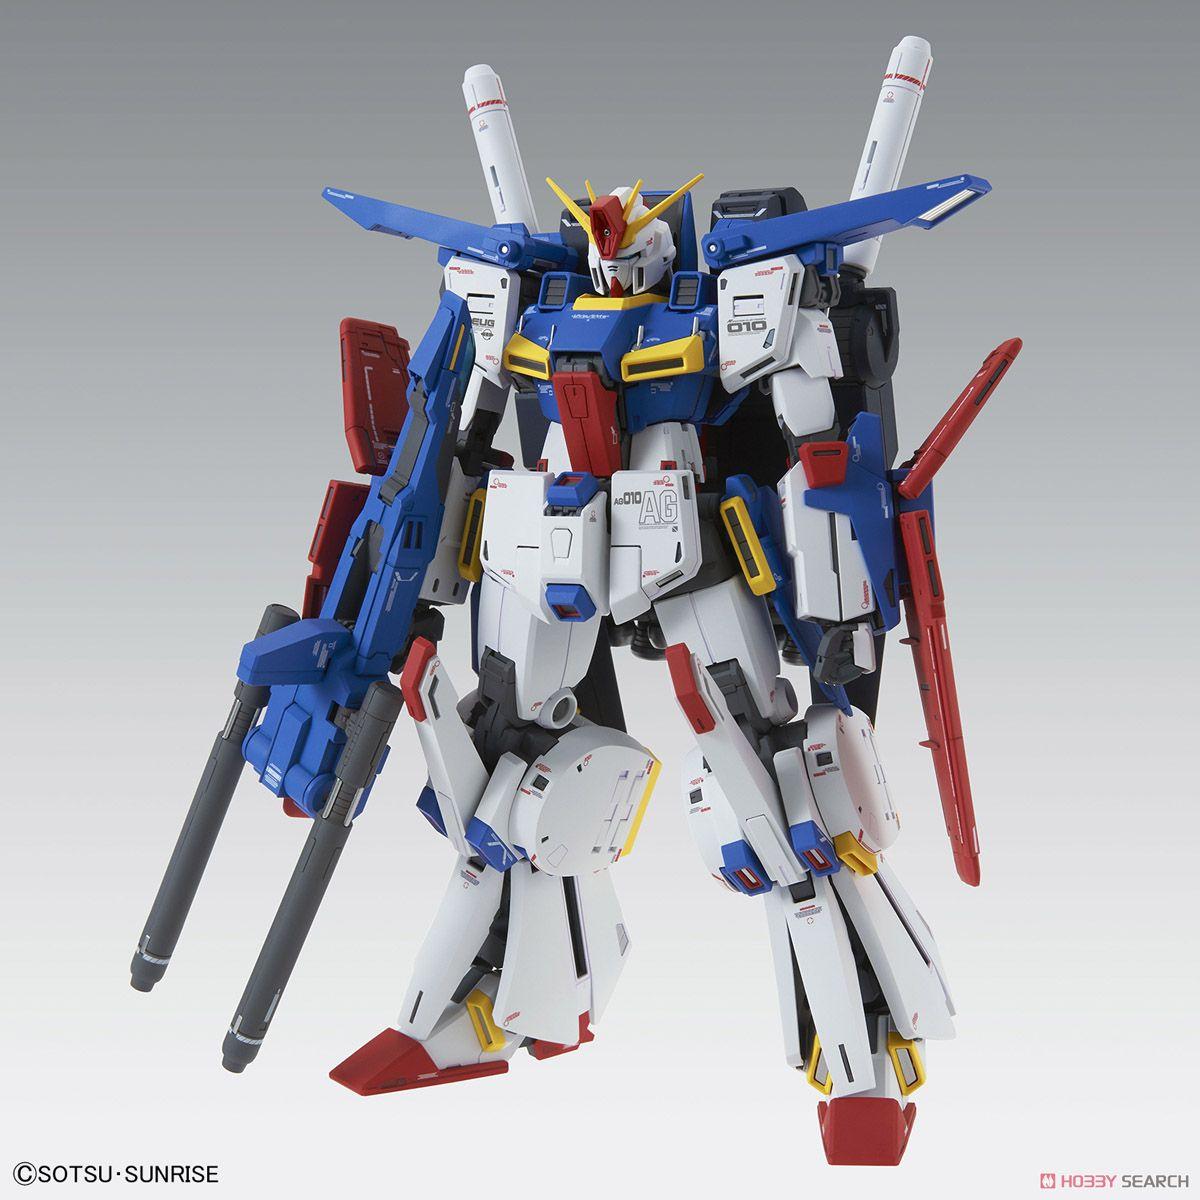 Bandai Msz 010 Zz Gundam Verka Mg End 7152020 1030 Pm